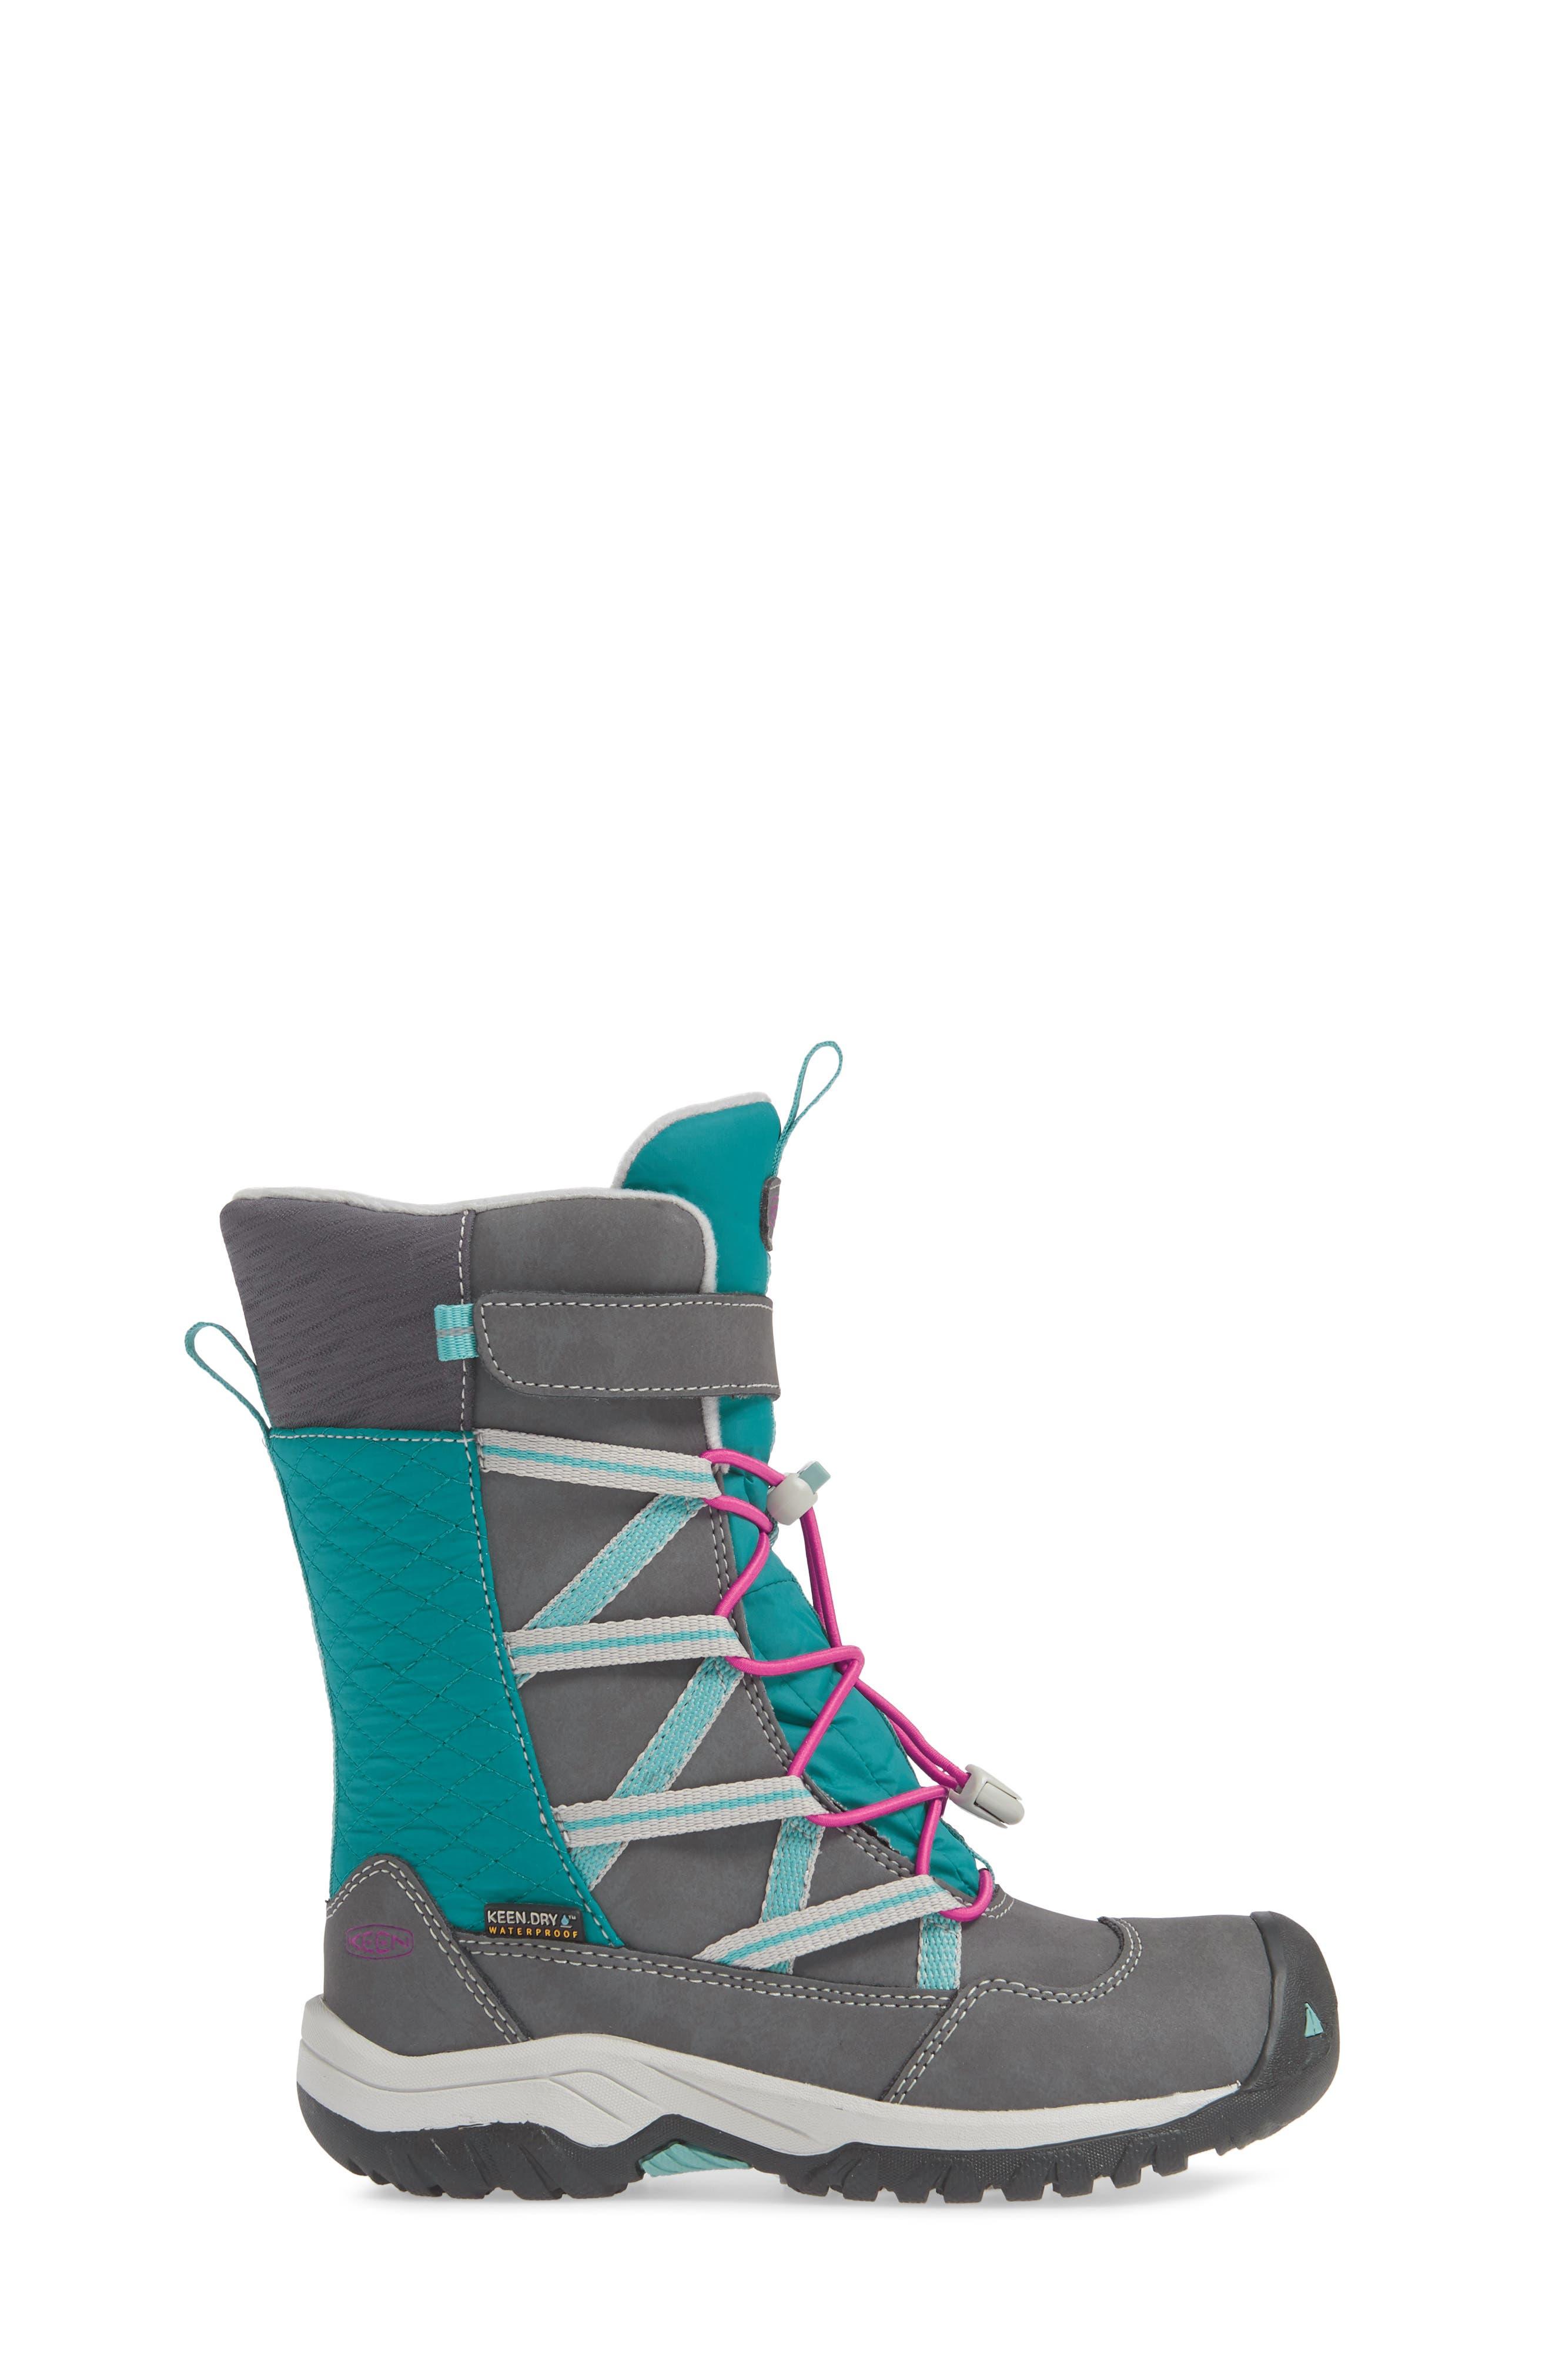 KEEN, Hoodoo Waterproof Insulated Boot, Alternate thumbnail 3, color, STEEL GREY/ CABARET